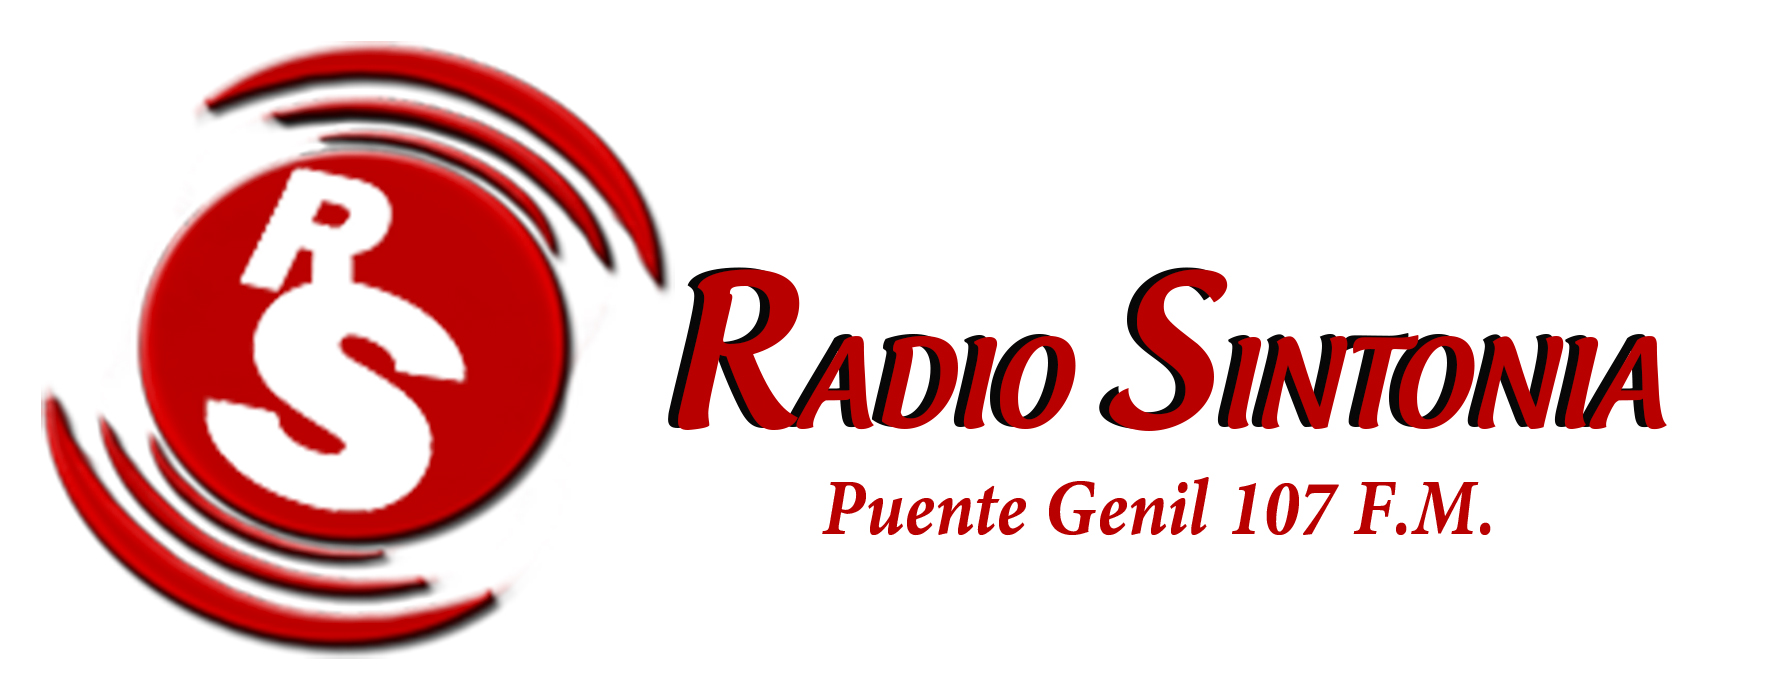 Radio Sintonia 107 FM